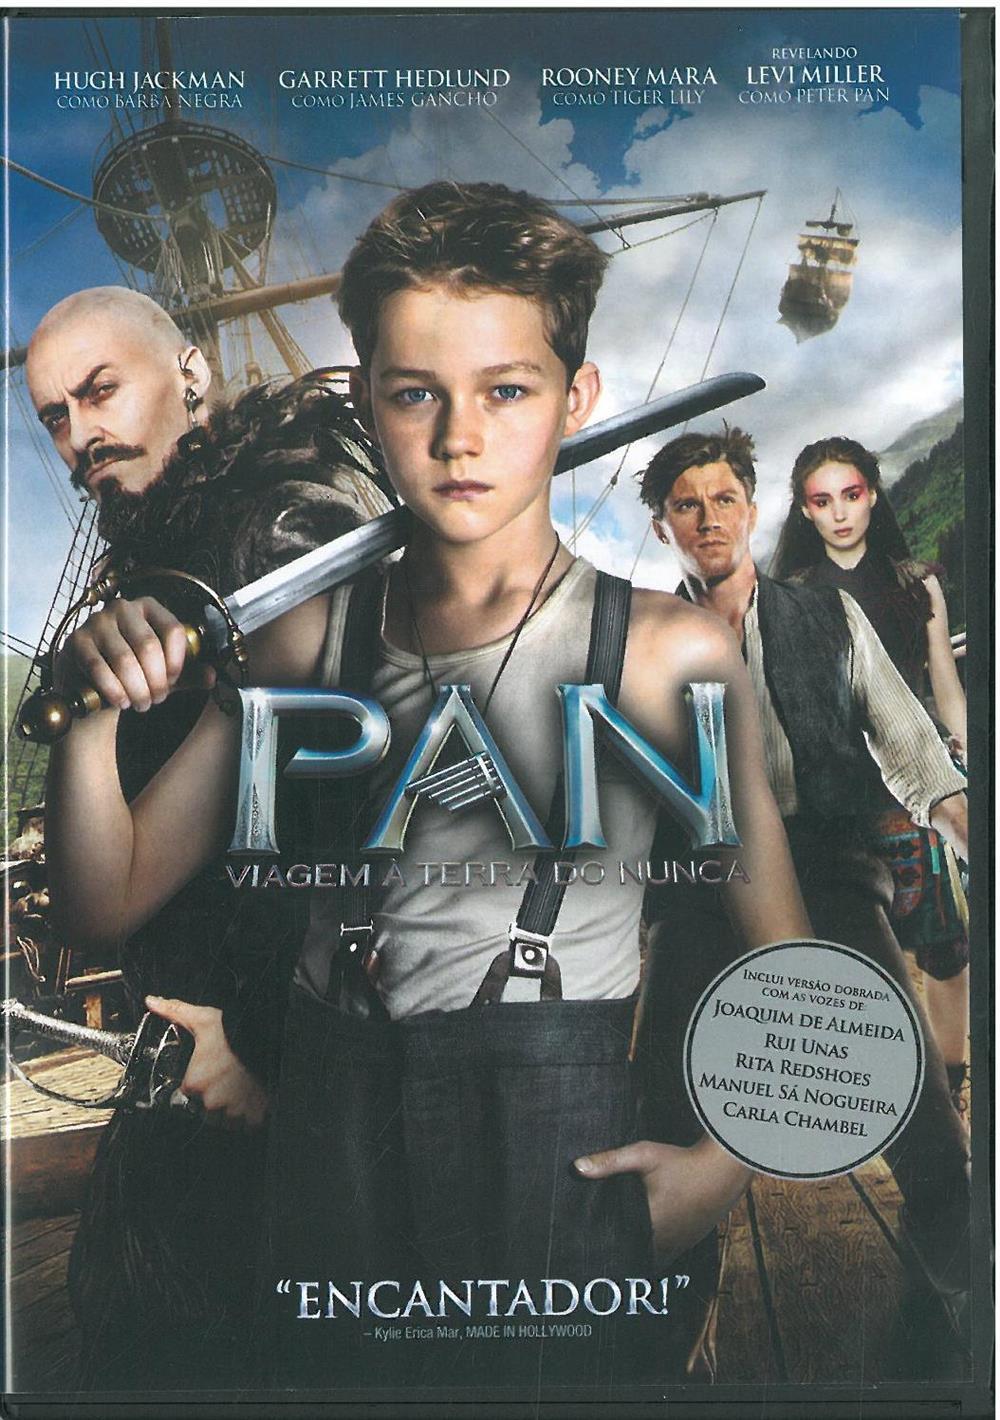 Pan_viagem à Terra do Nunca_DVD.jpg